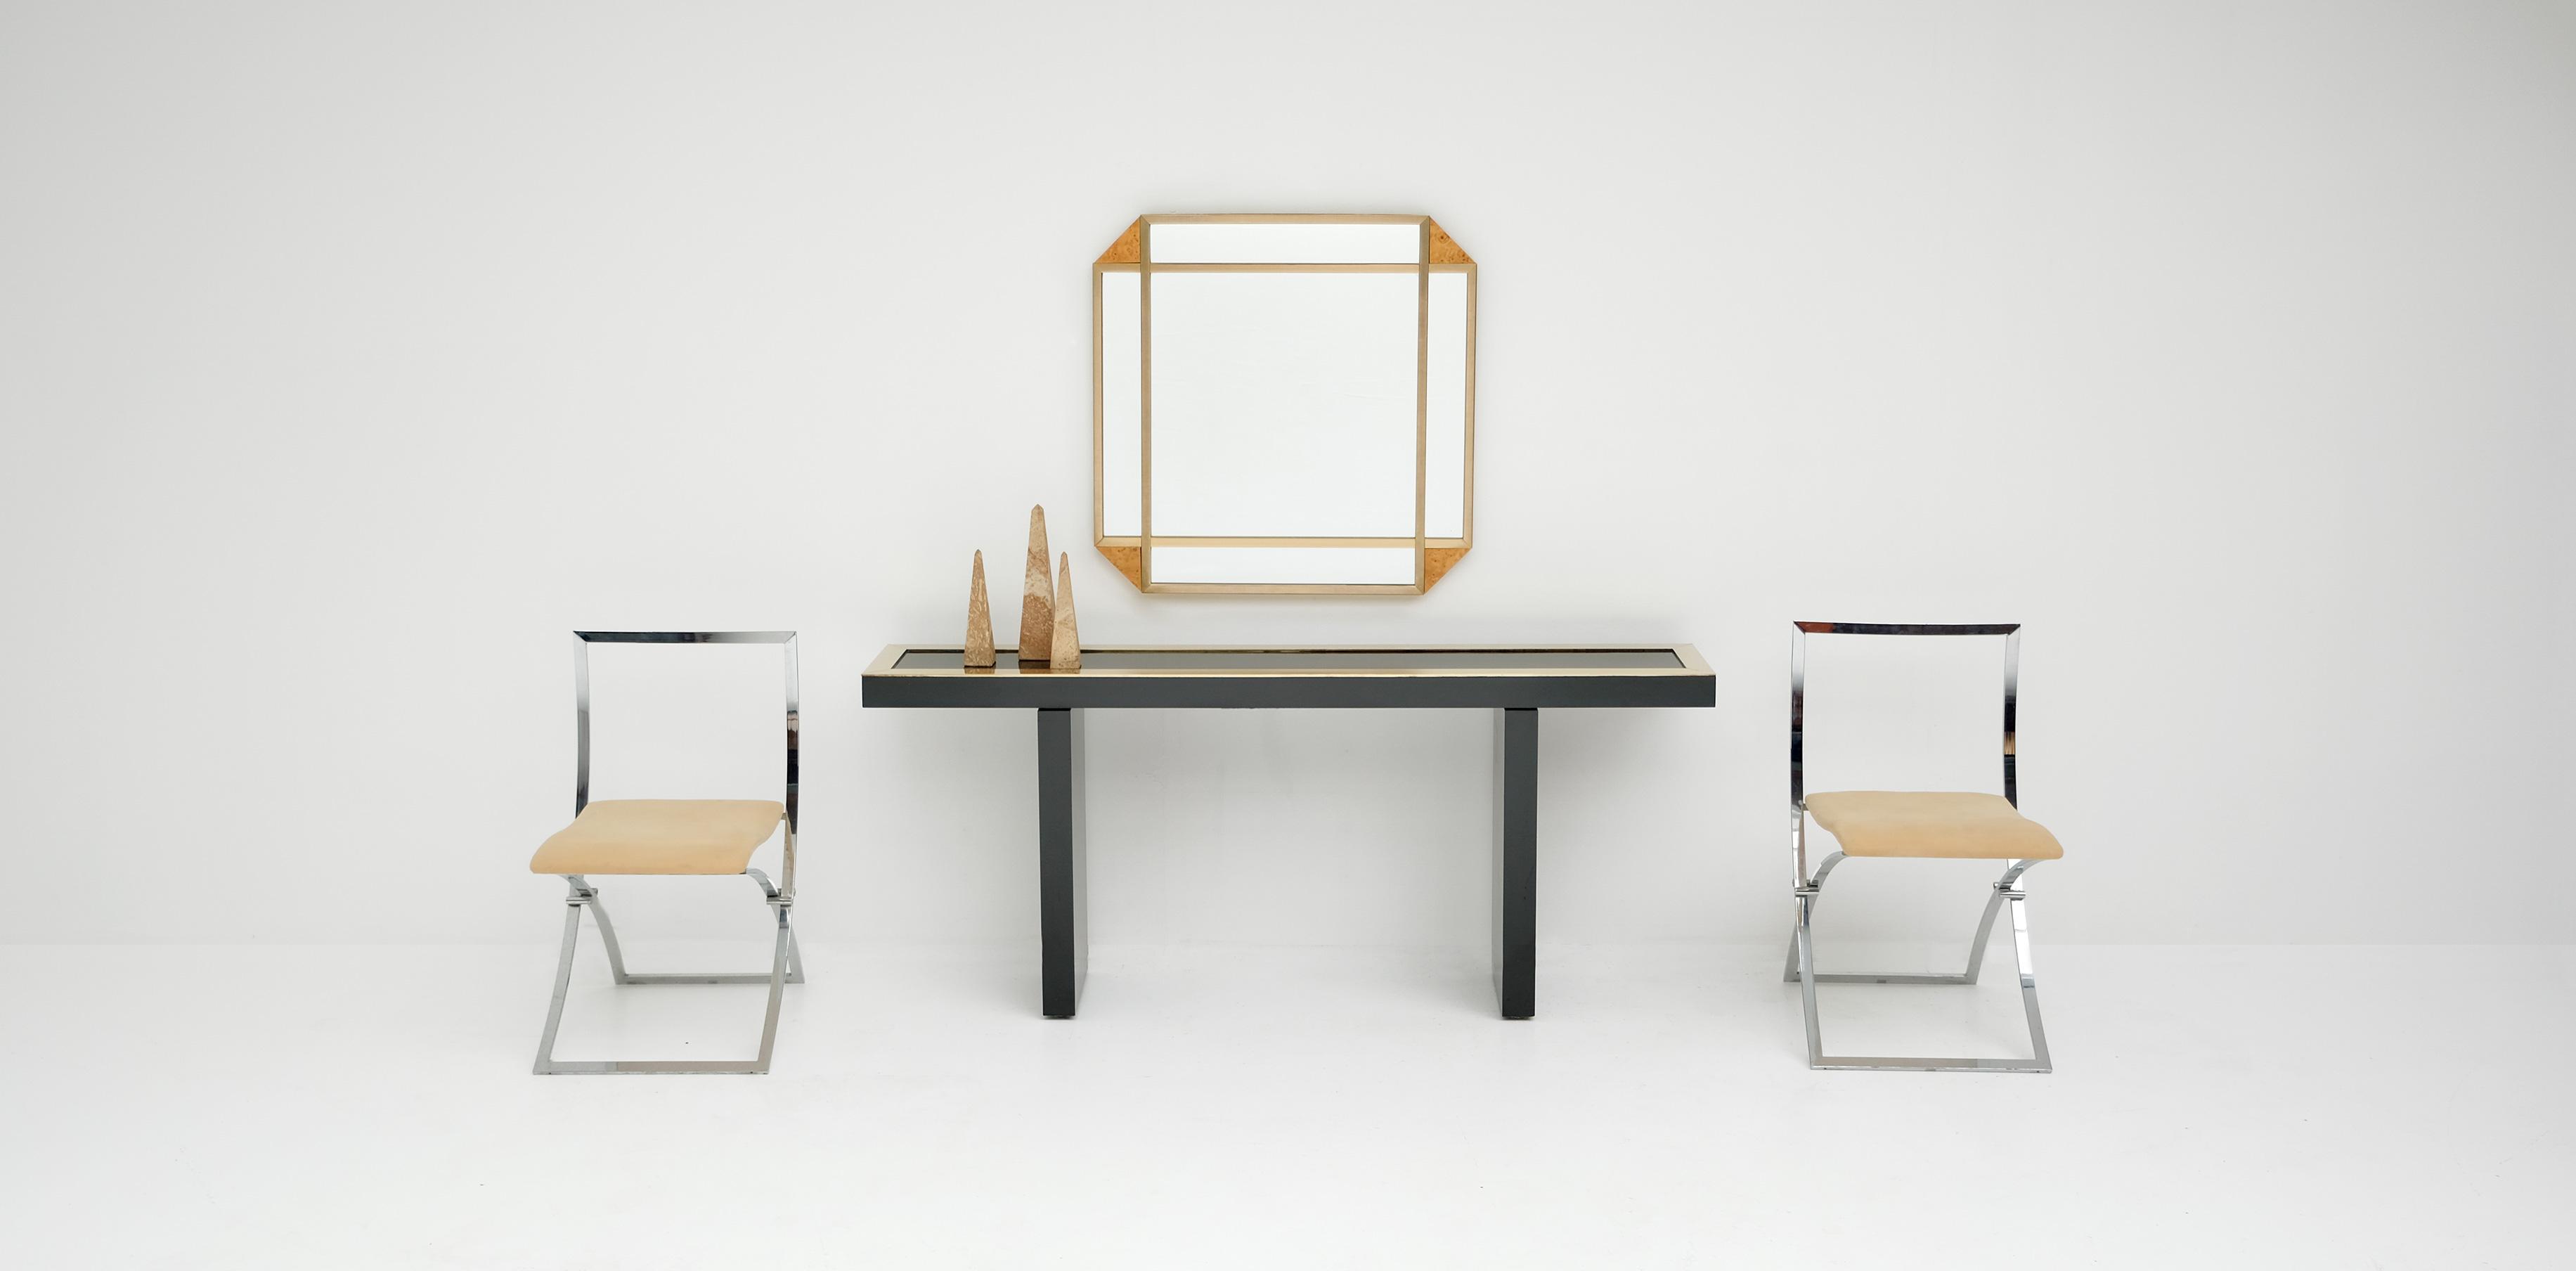 Design furniture online - City Furniture Online Gallery For Vintage Modern And Contemporary Design